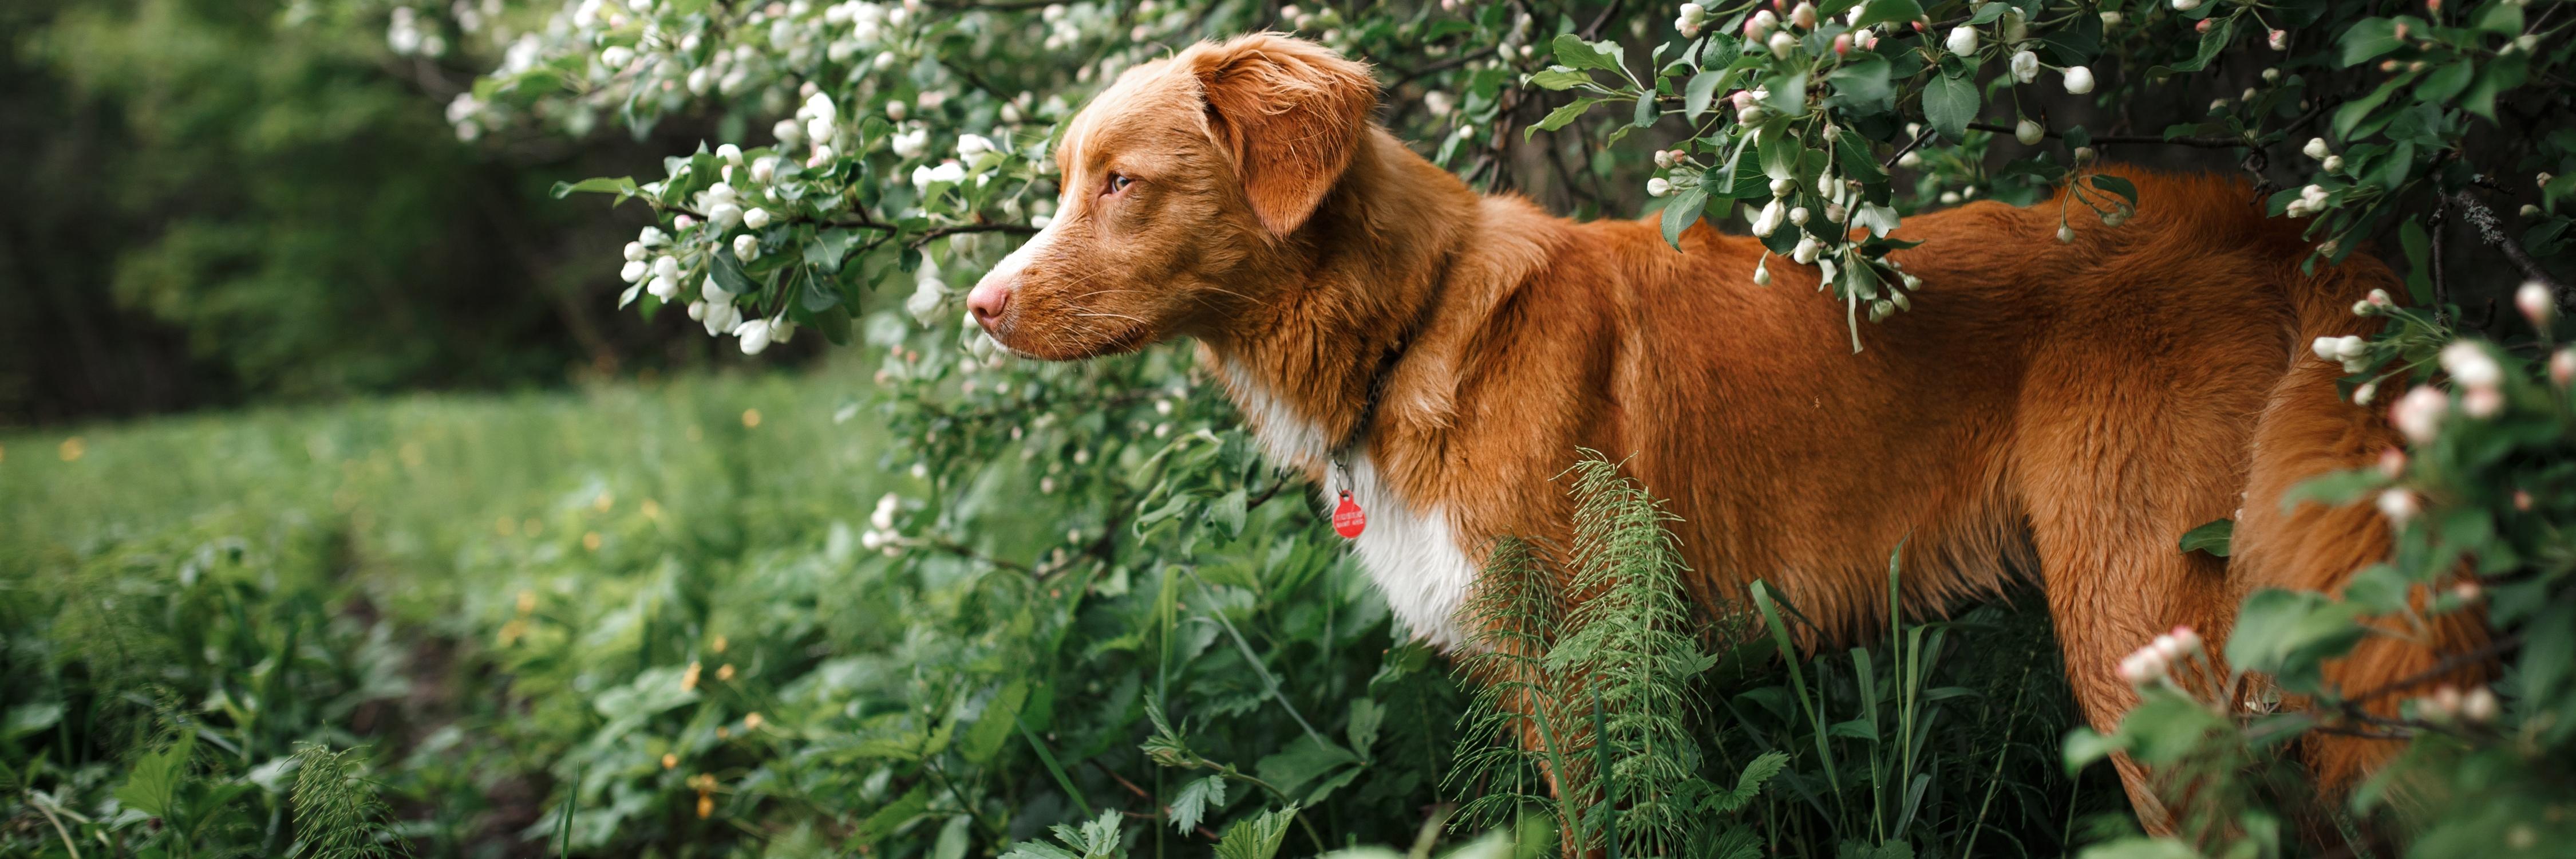 Hond in het struikgewas